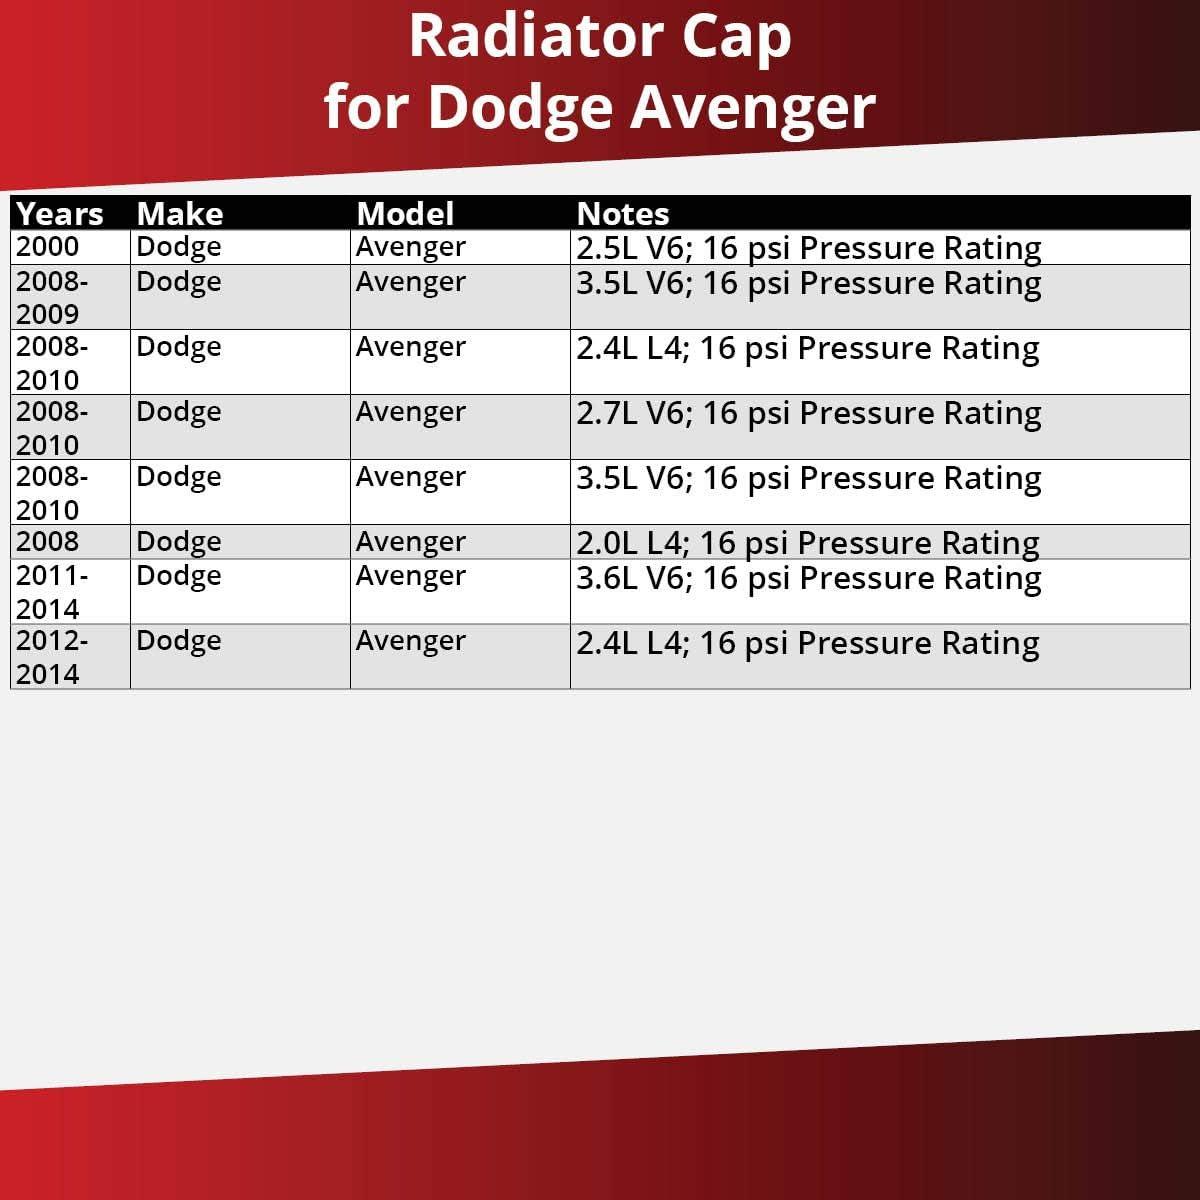 Gates Radiator Cap for 2000-2014 Dodge Avenger 3.6L 2.7L 3.5L 2.5L V6 2.4L 2.0L L4 Antifreeze Coolant Pump